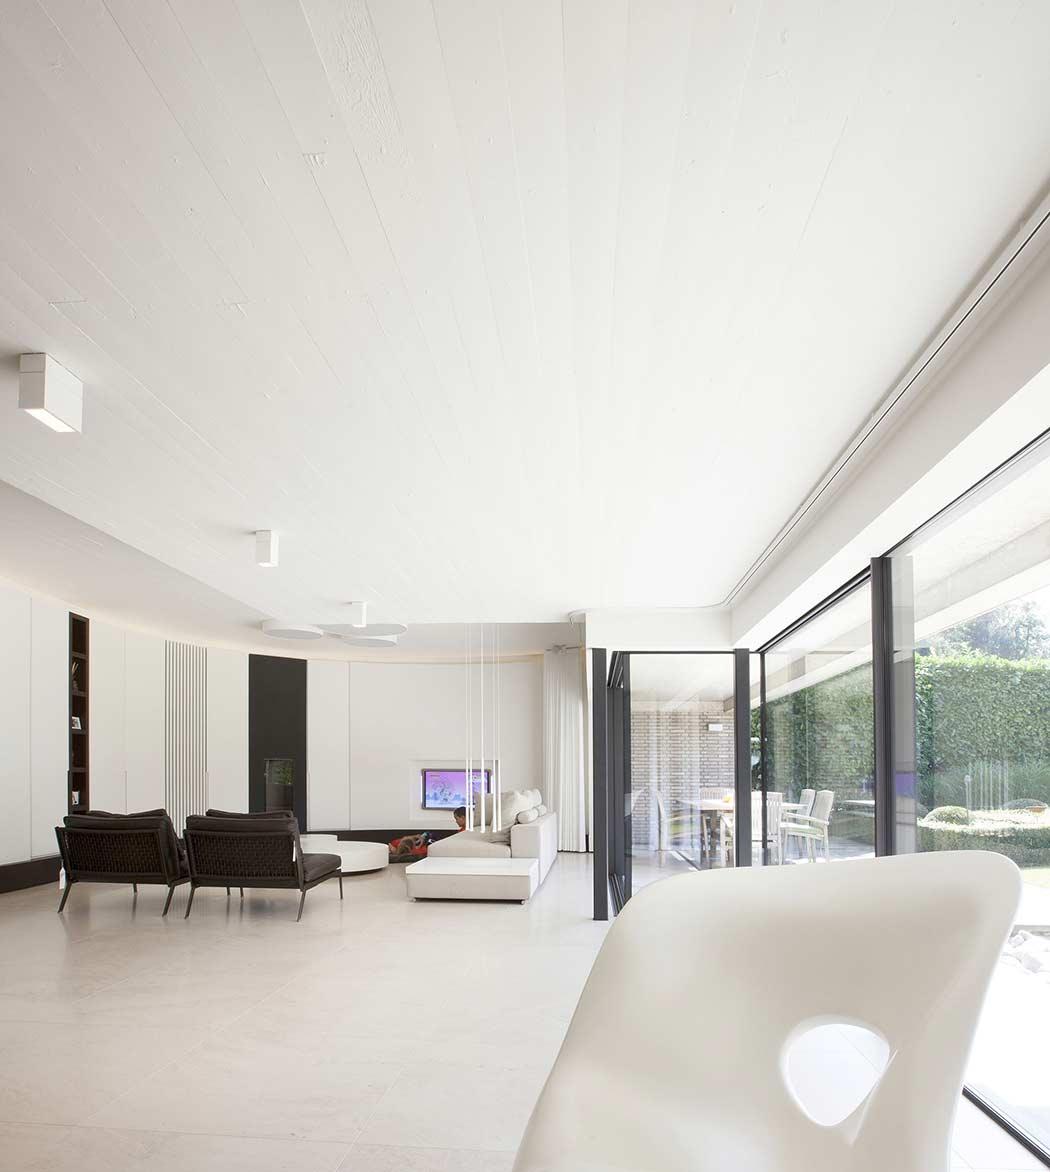 De 50 fotos de salas decoradas modernas peque as for Decoracion de interiores minimalistas 2016